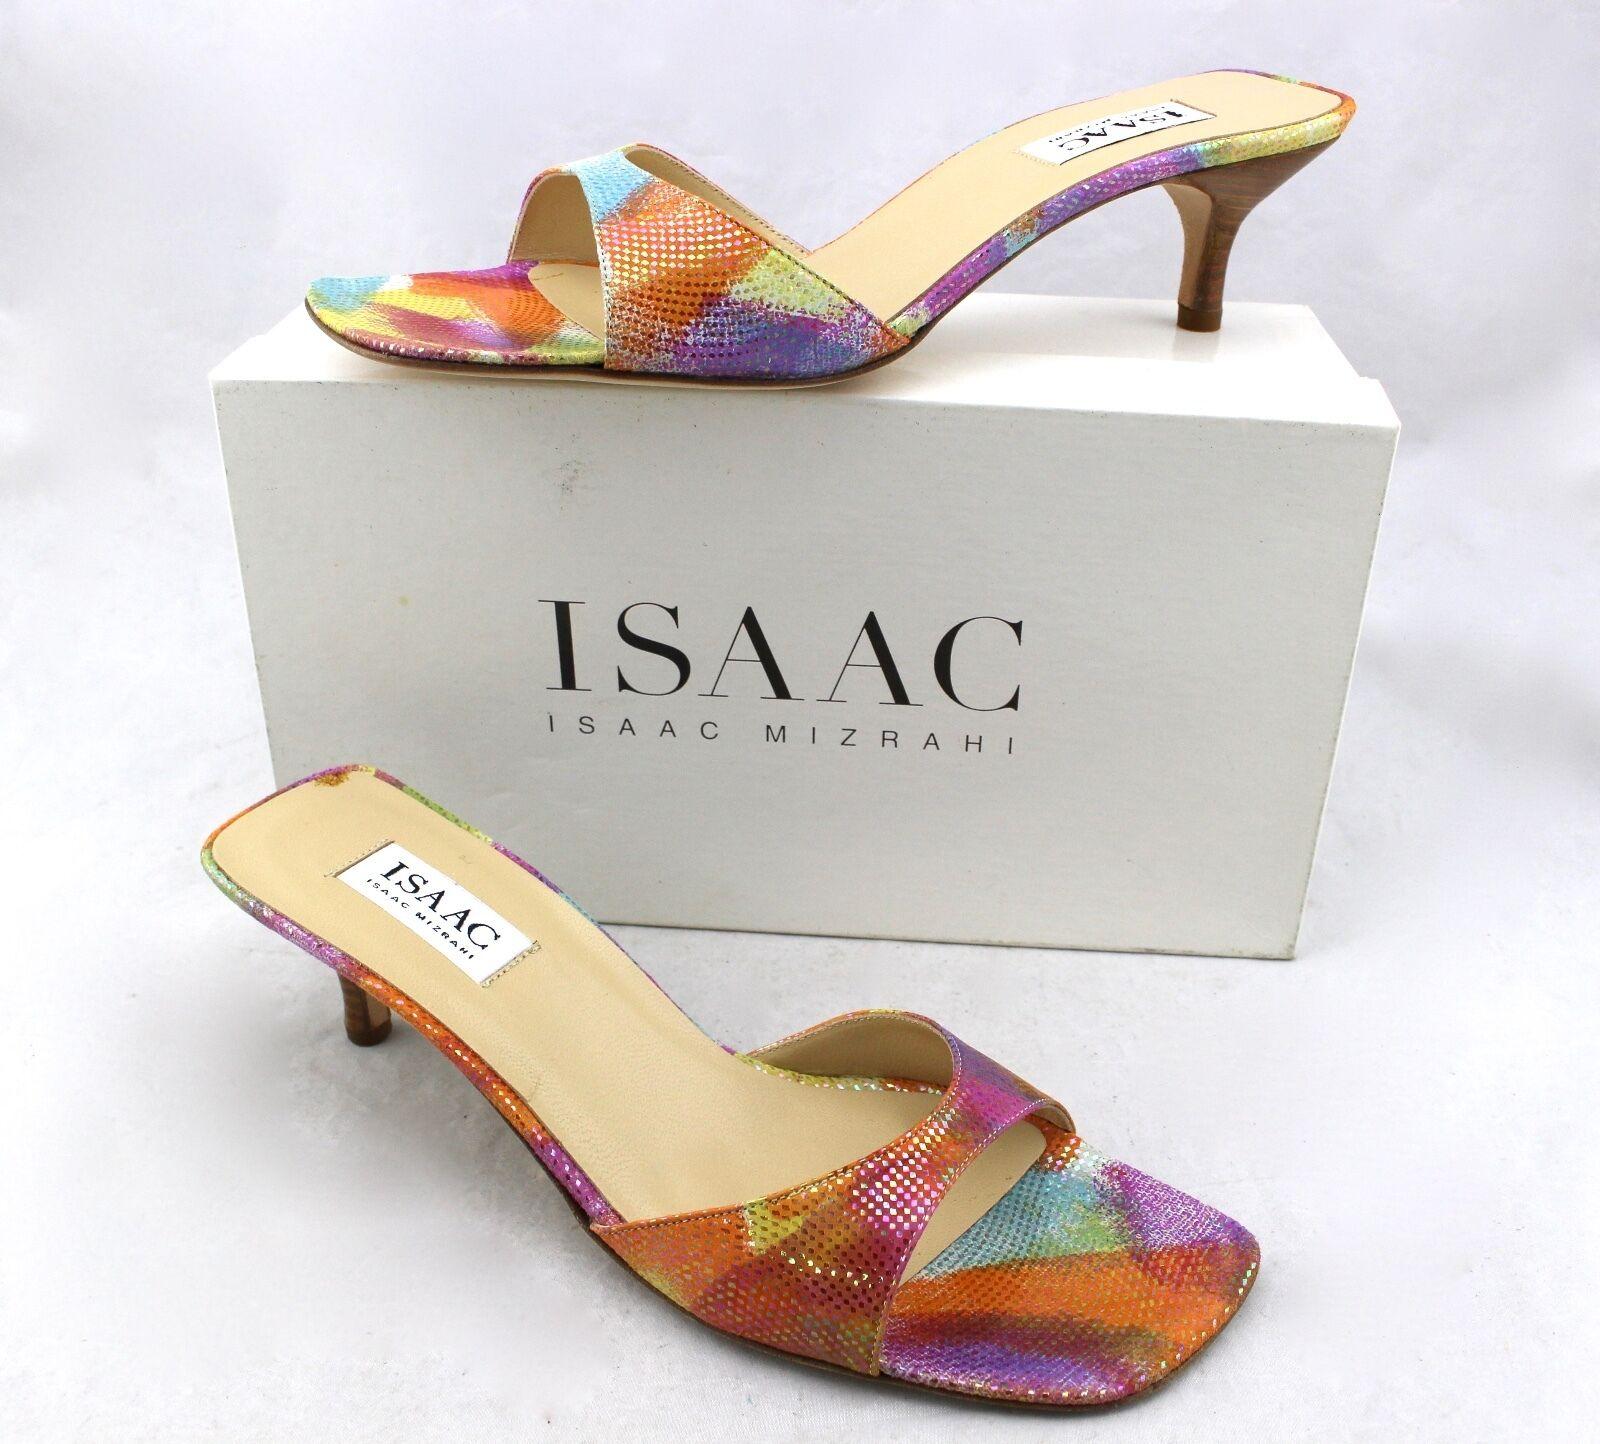 ISAAC Isaac Iridescent Mizrahi Sandee Multi-Farbe Rainbow Iridescent Isaac Sandales Slides Heels 27e45a